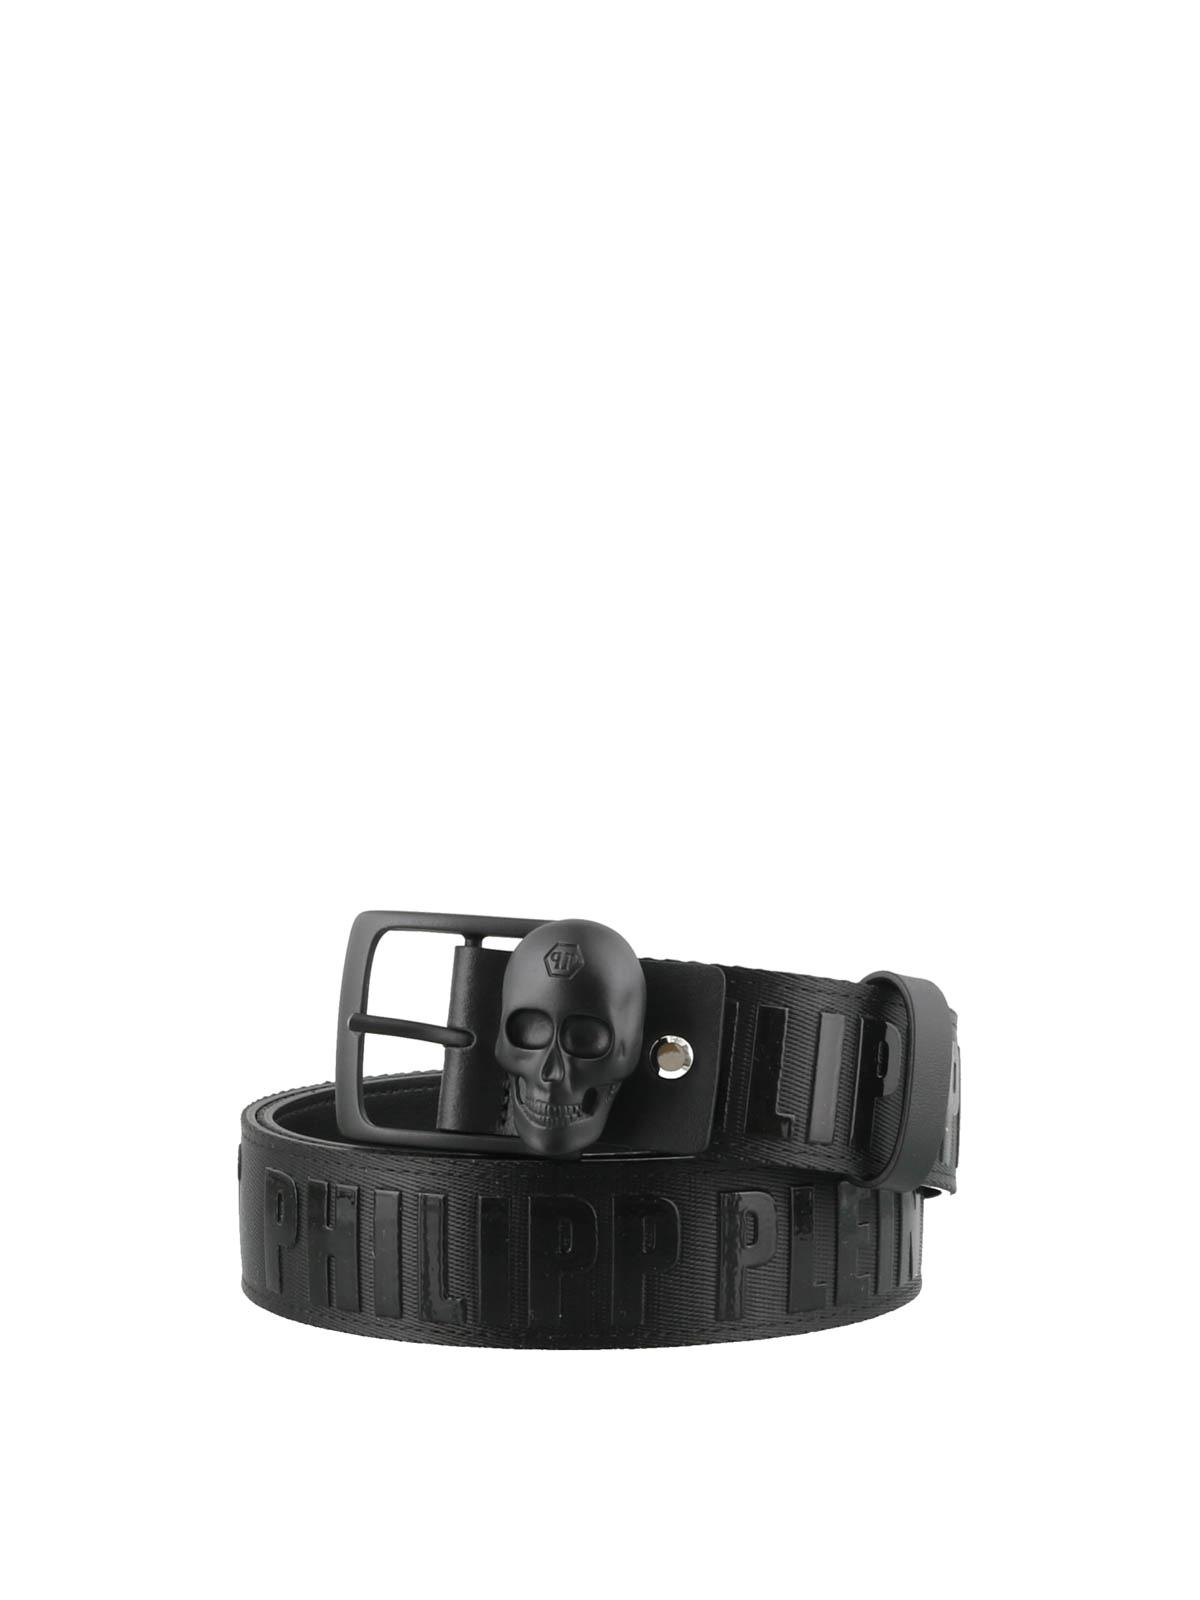 dd825b71862 Philipp Plein - Skull buckle black cotton belt - belts ...